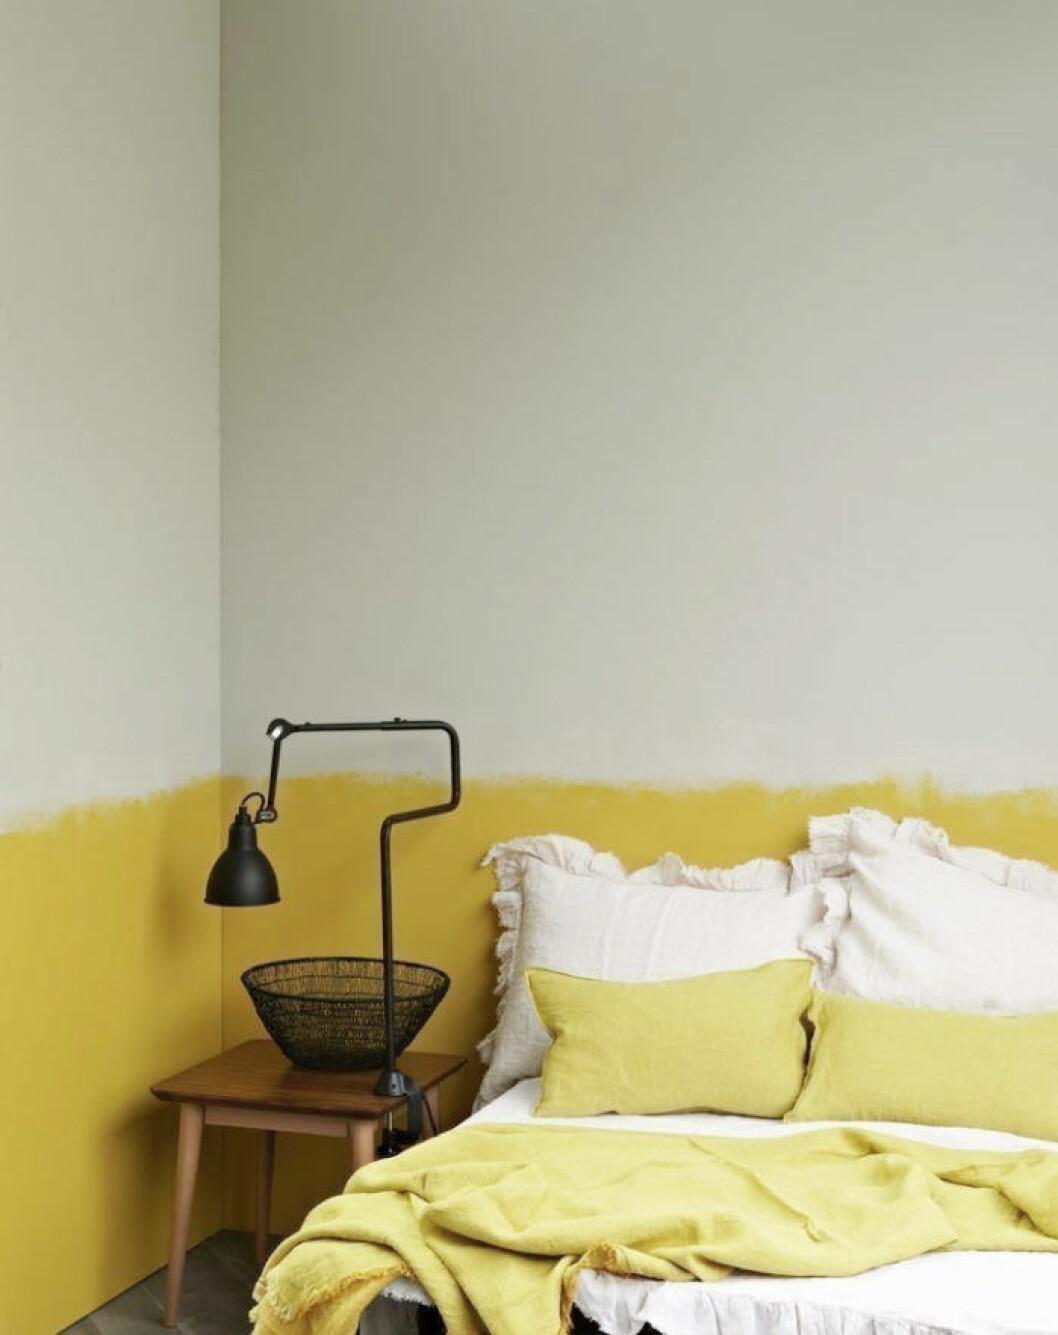 Tvädelad färg i sovrum